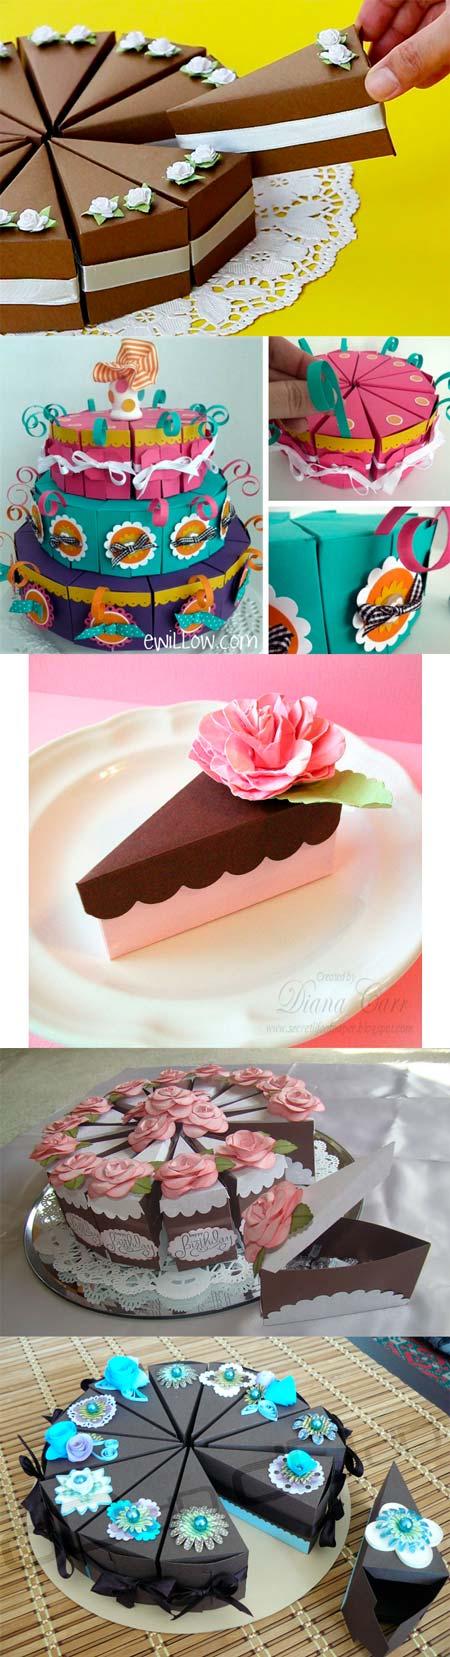 Бумажный торт - коллаж